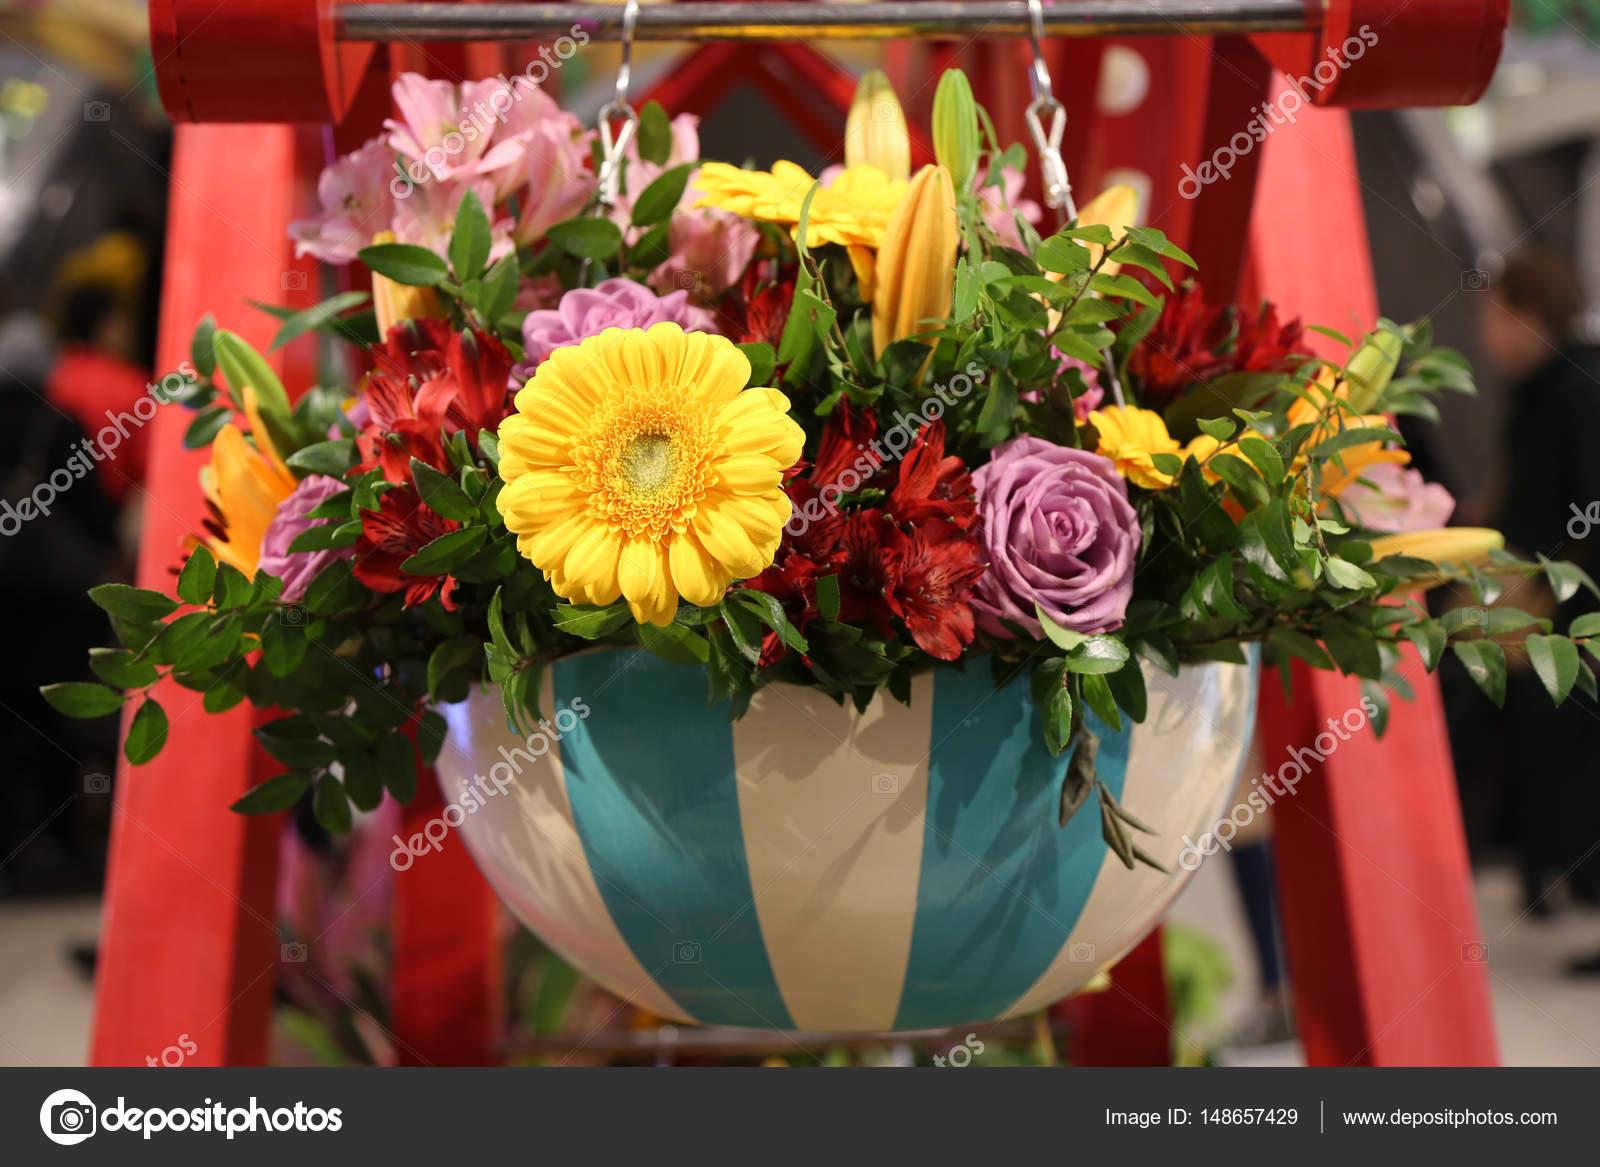 Flower arrangement during famous macys annual flower show in the flower arrangement during famous macys annual flower show in the macys herald square stock photo izmirmasajfo